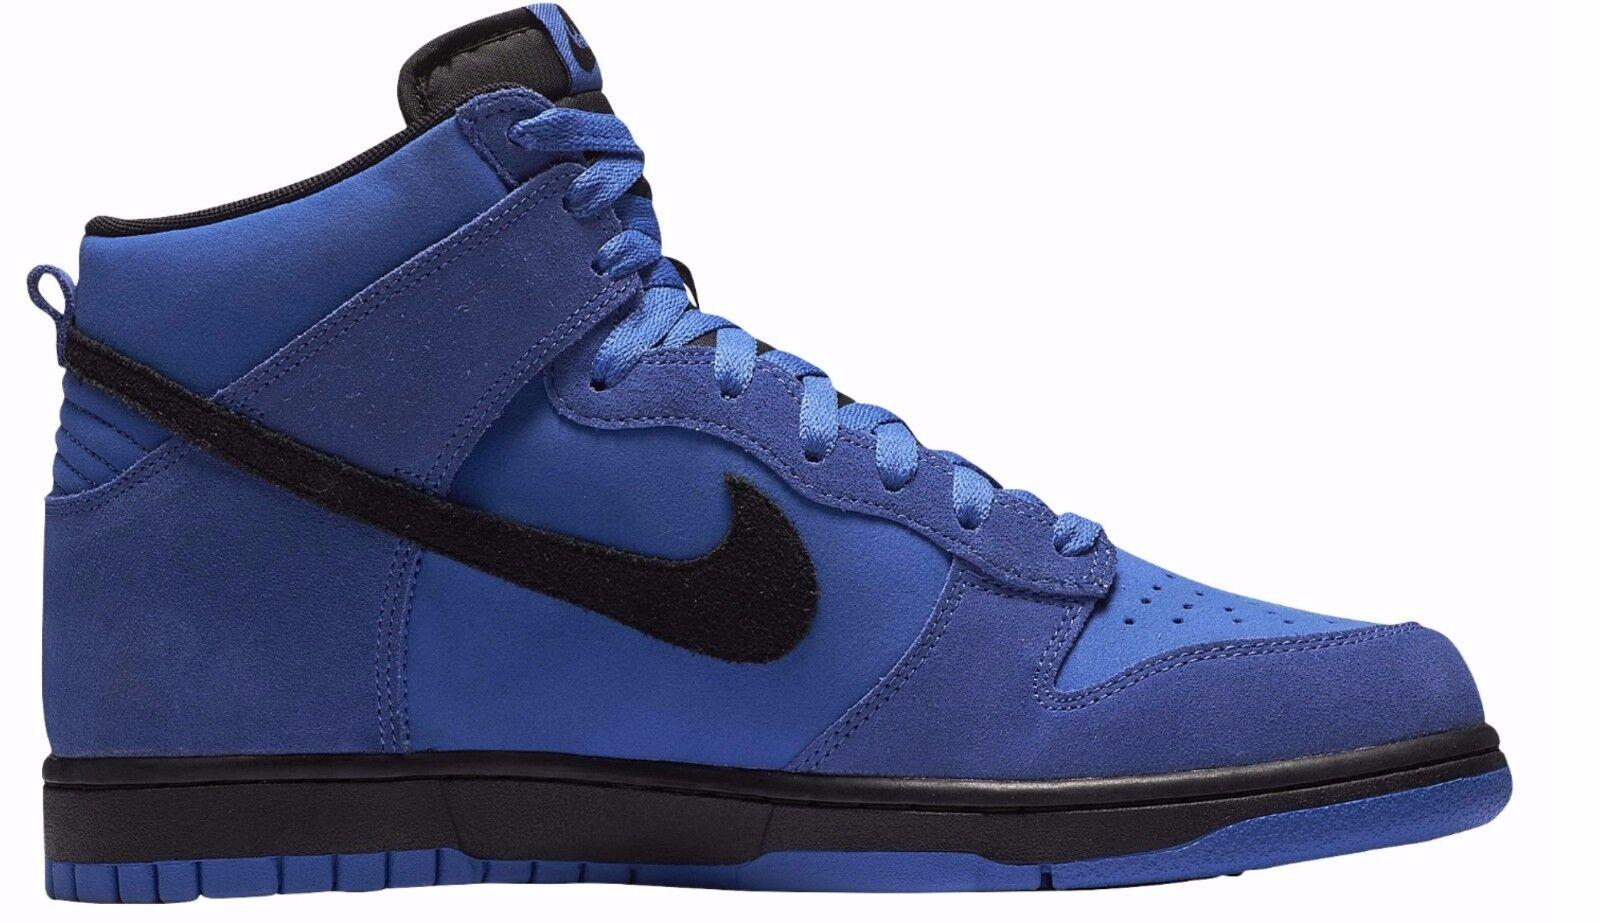 New! NIKE DUNK HI Comet Blue Black Shoes High force one 904233-002 Retro c1